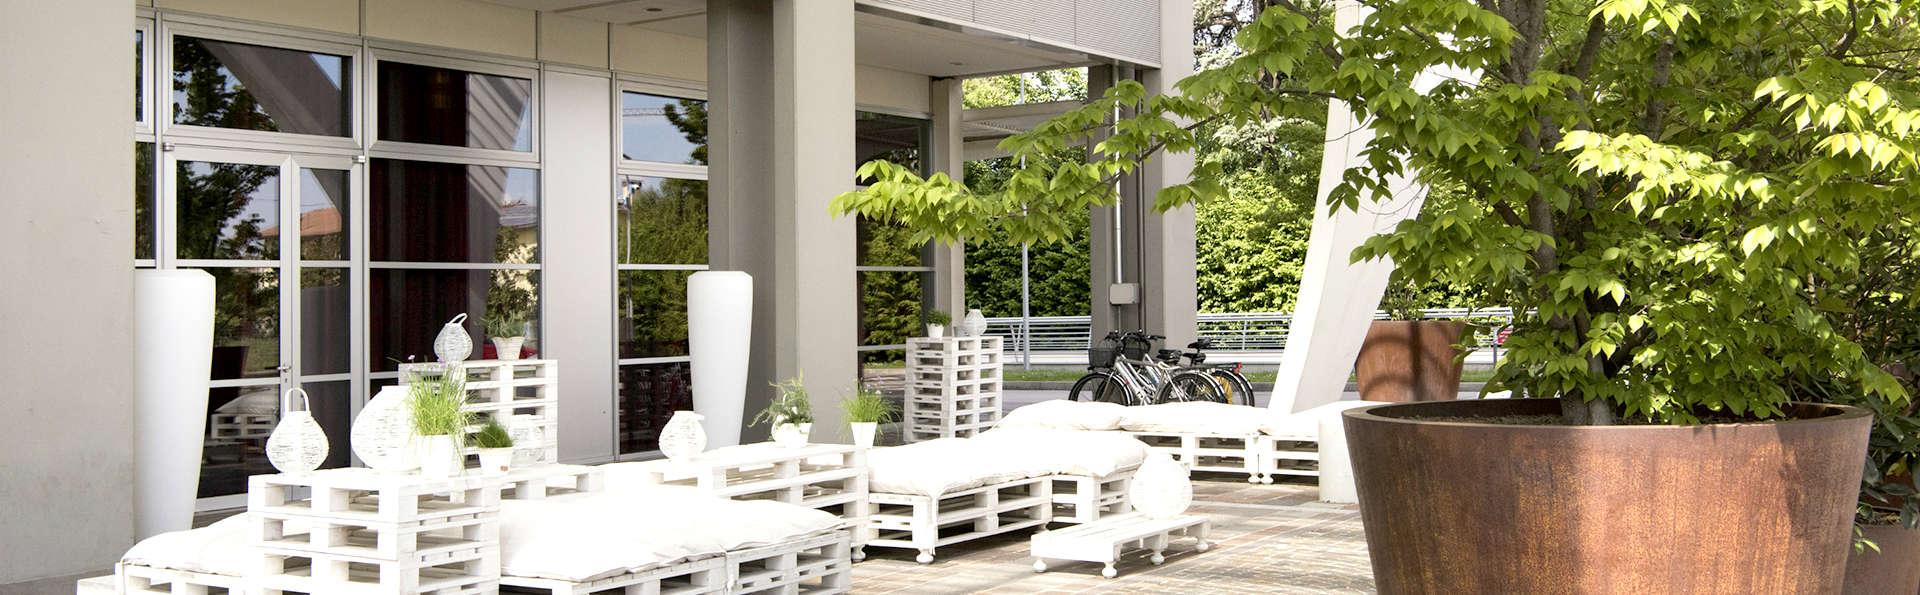 Best Western Premier BHR Treviso Hotel - Edit_Terrace.jpg